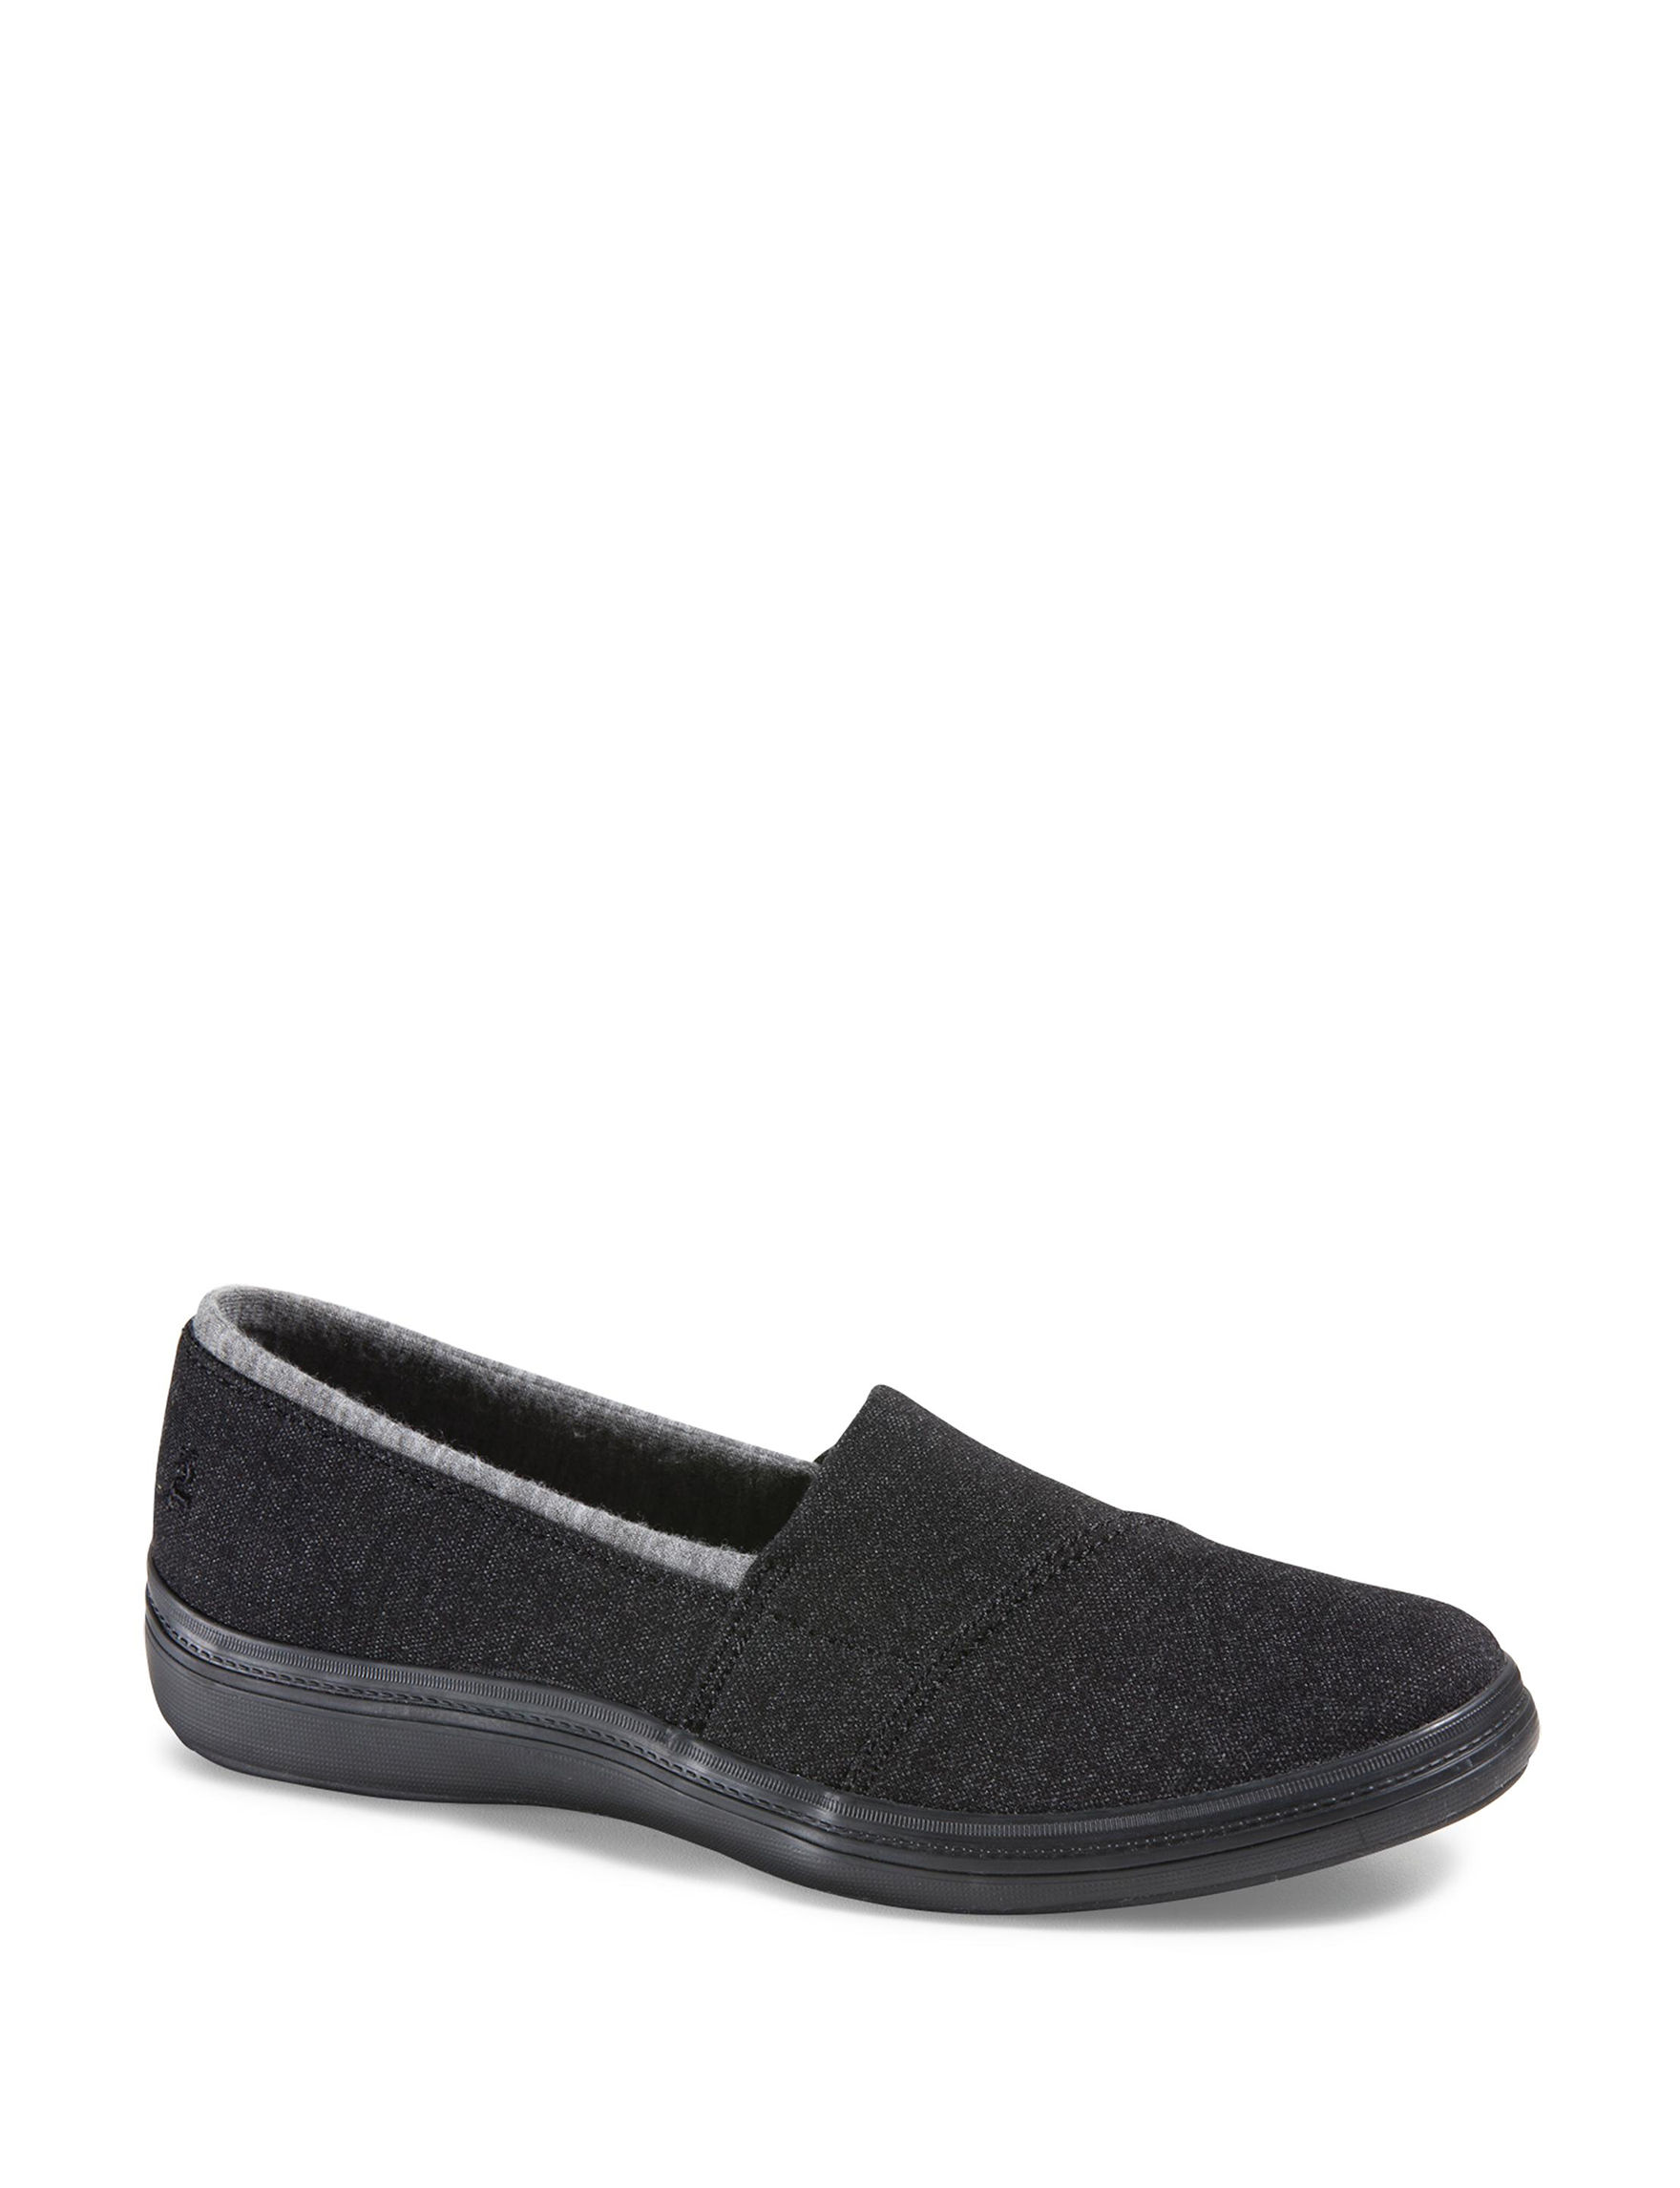 Grasshoppers Black Comfort Shoes